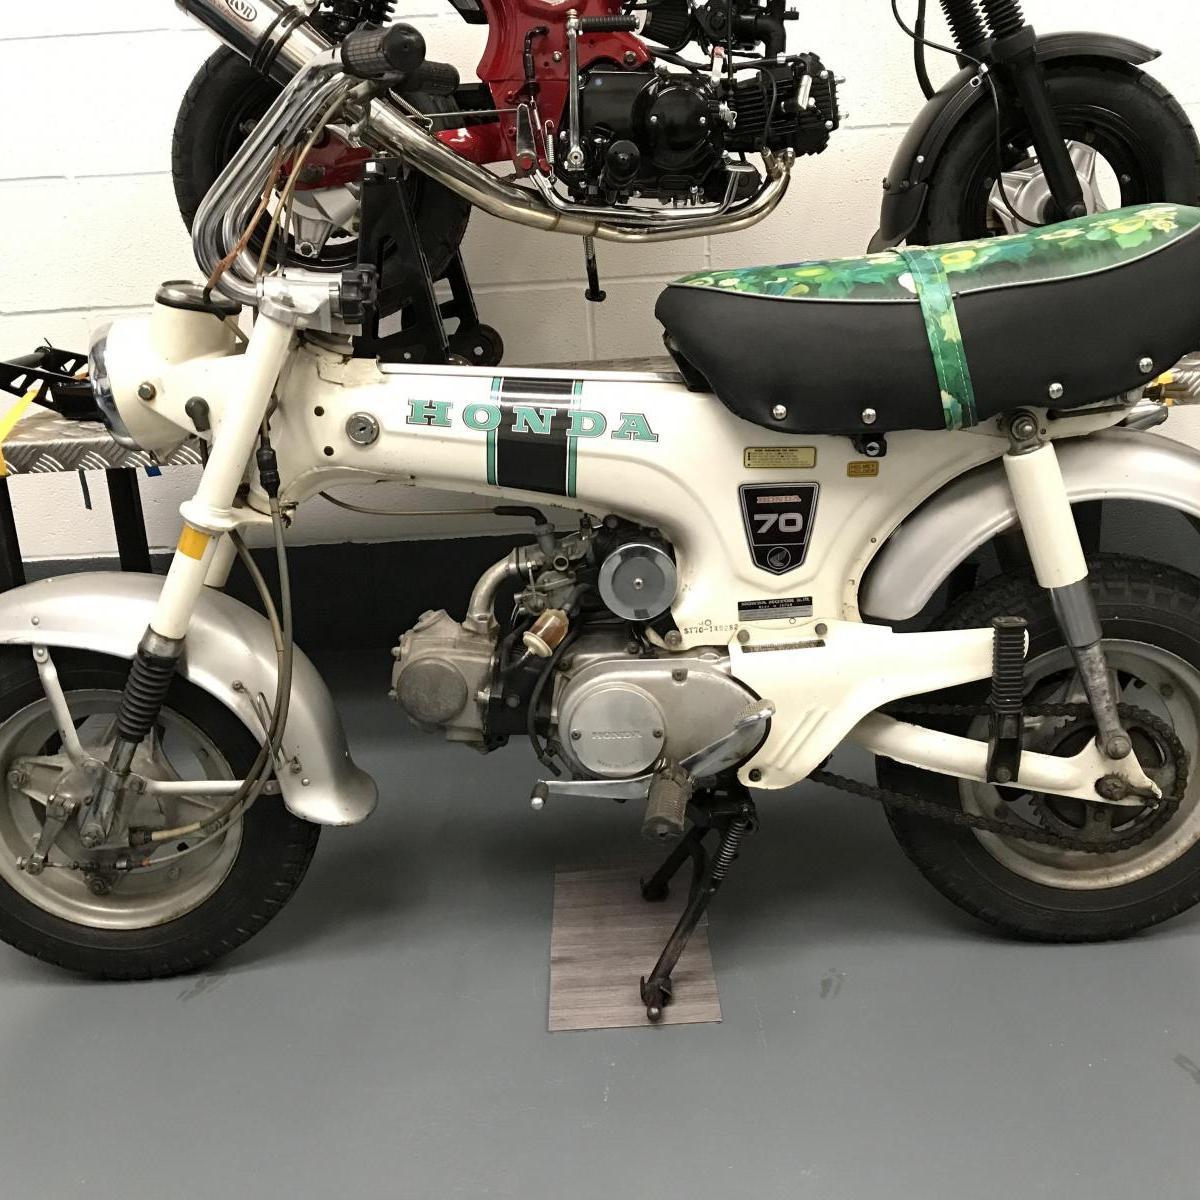 Honda ST70 Dax Limited Edition 1975